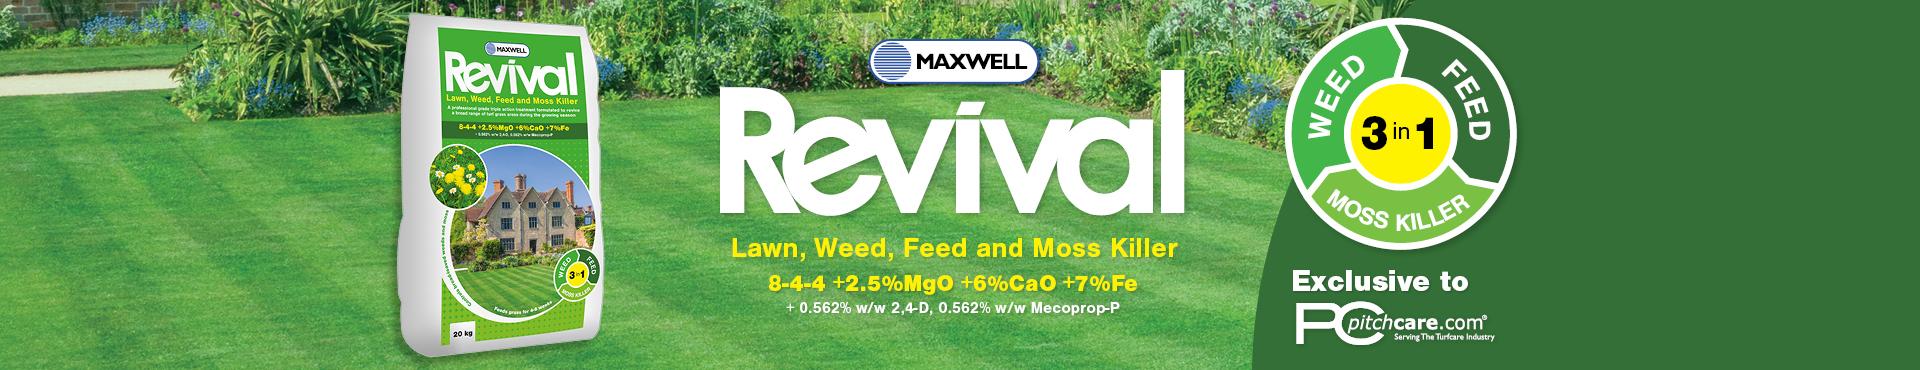 Revival Shop Banner 2017